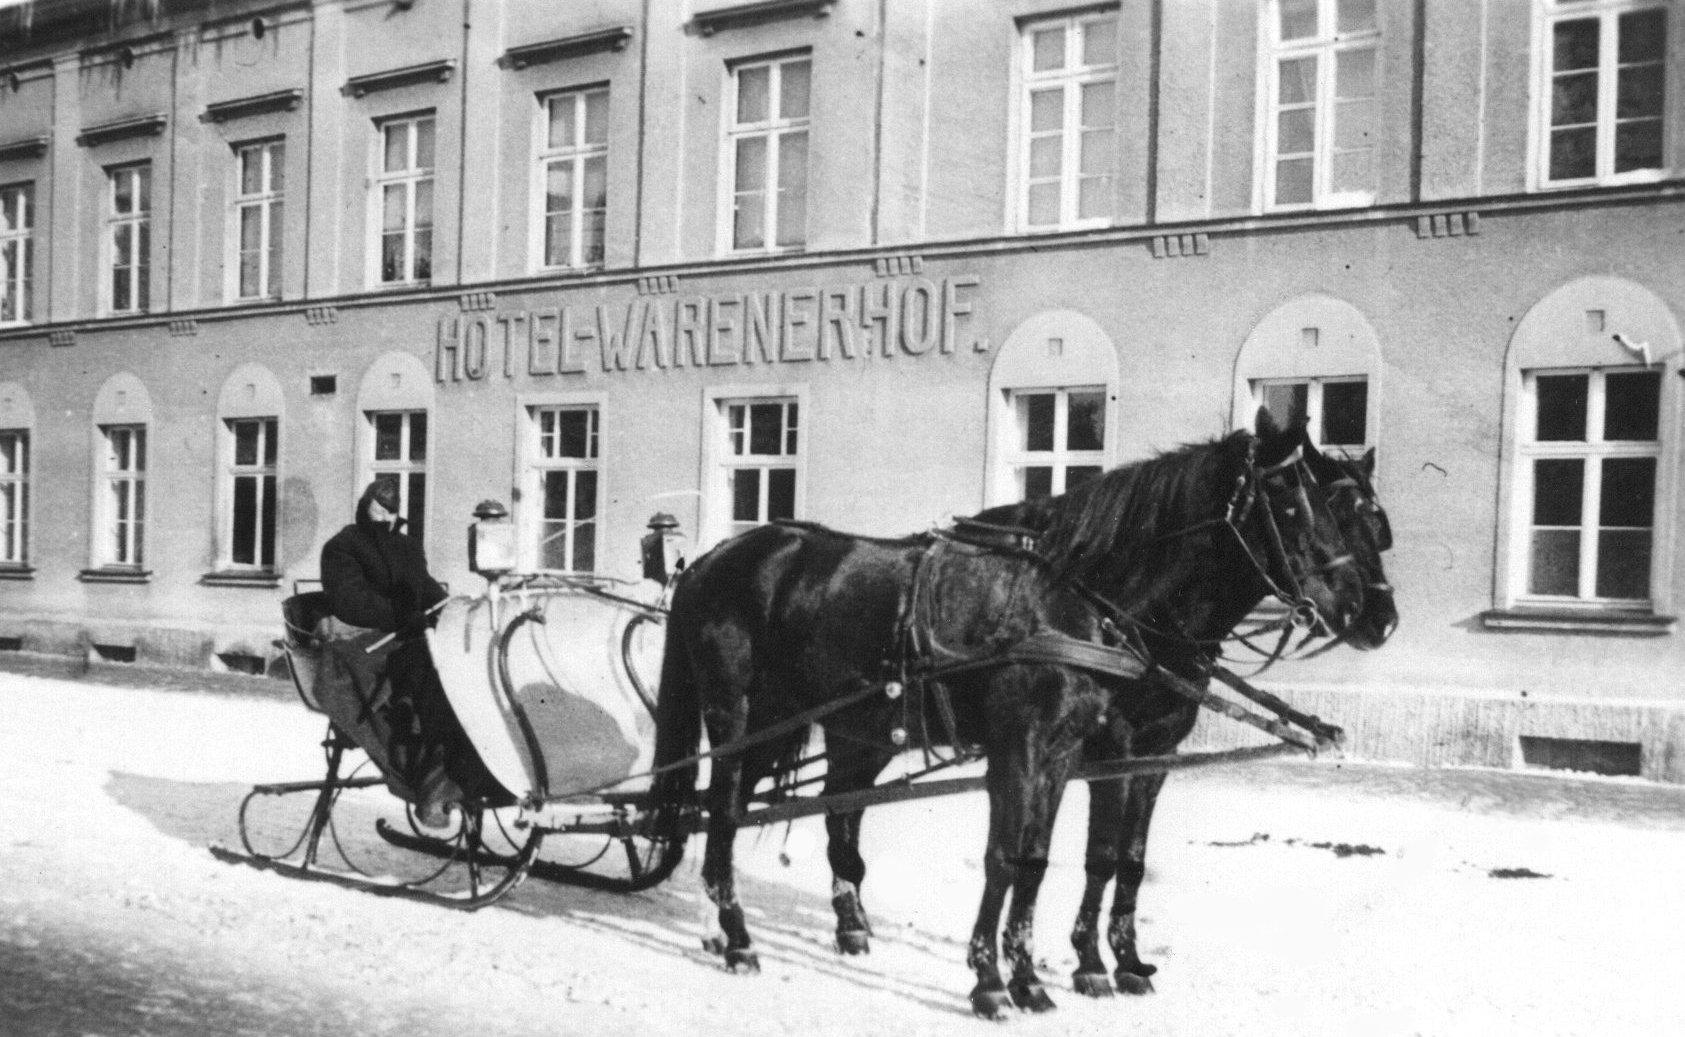 Winter 1930